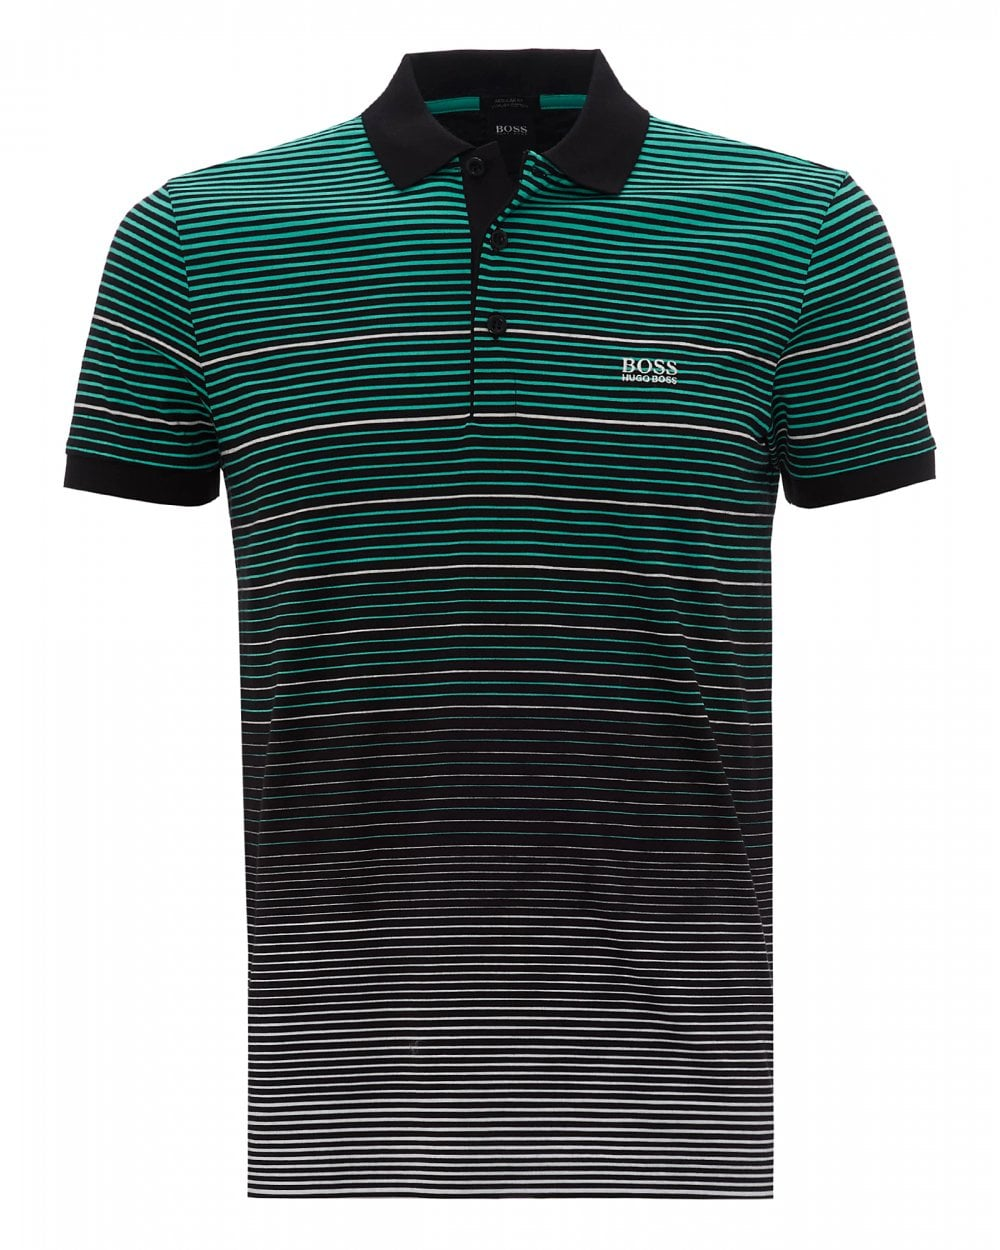 d80fddb18c BOSS Mens Paddy 3 Black Striped Polo Shirt - Menswear from Repertoire UK